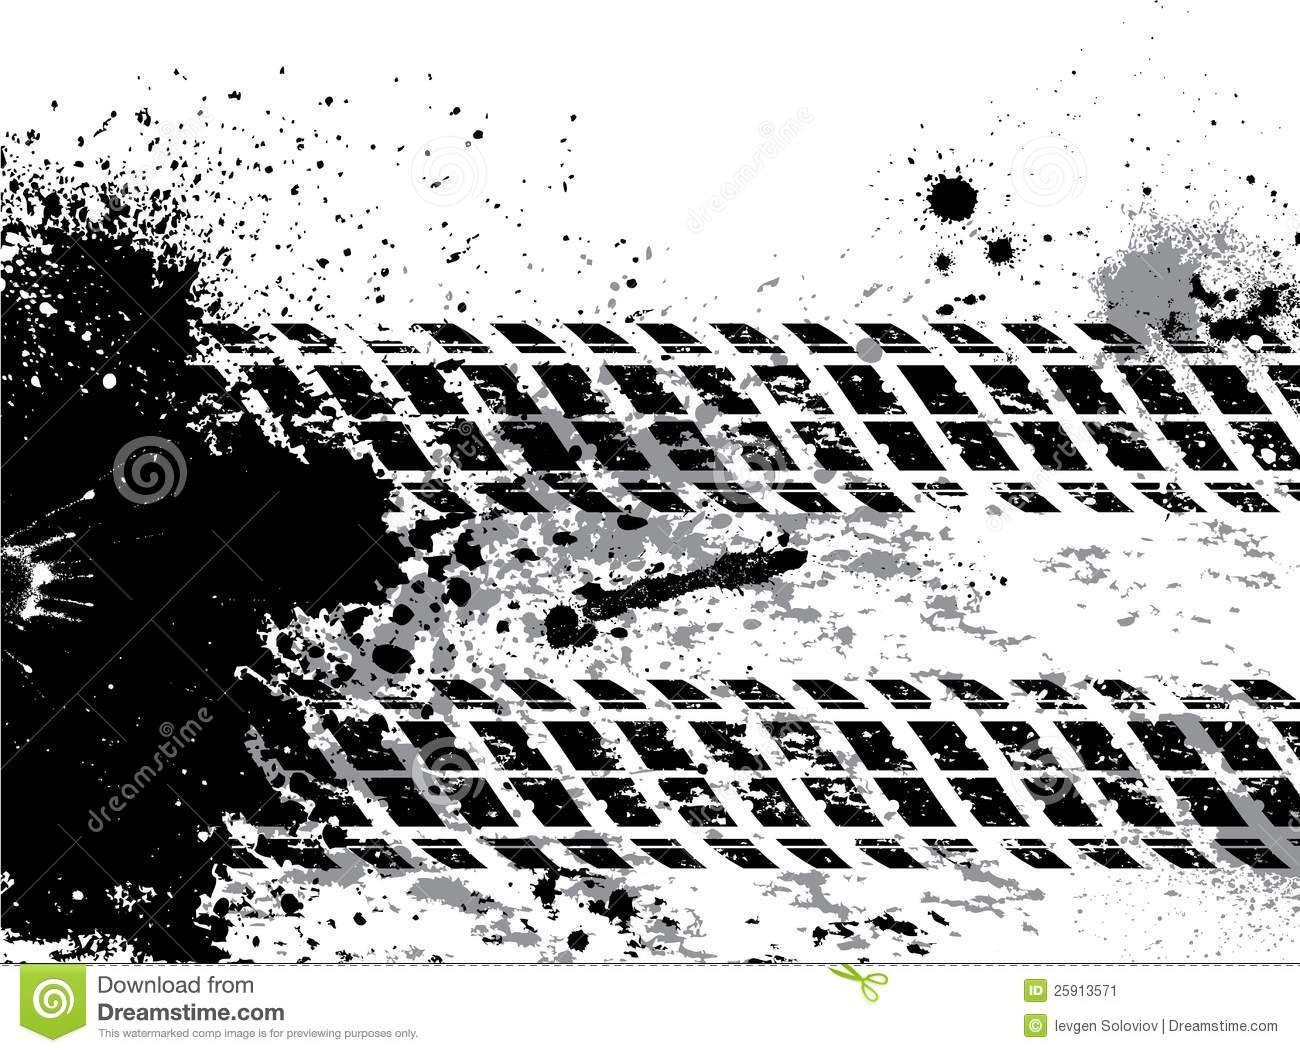 Monster tracks clip art. Track clipart truck tire track